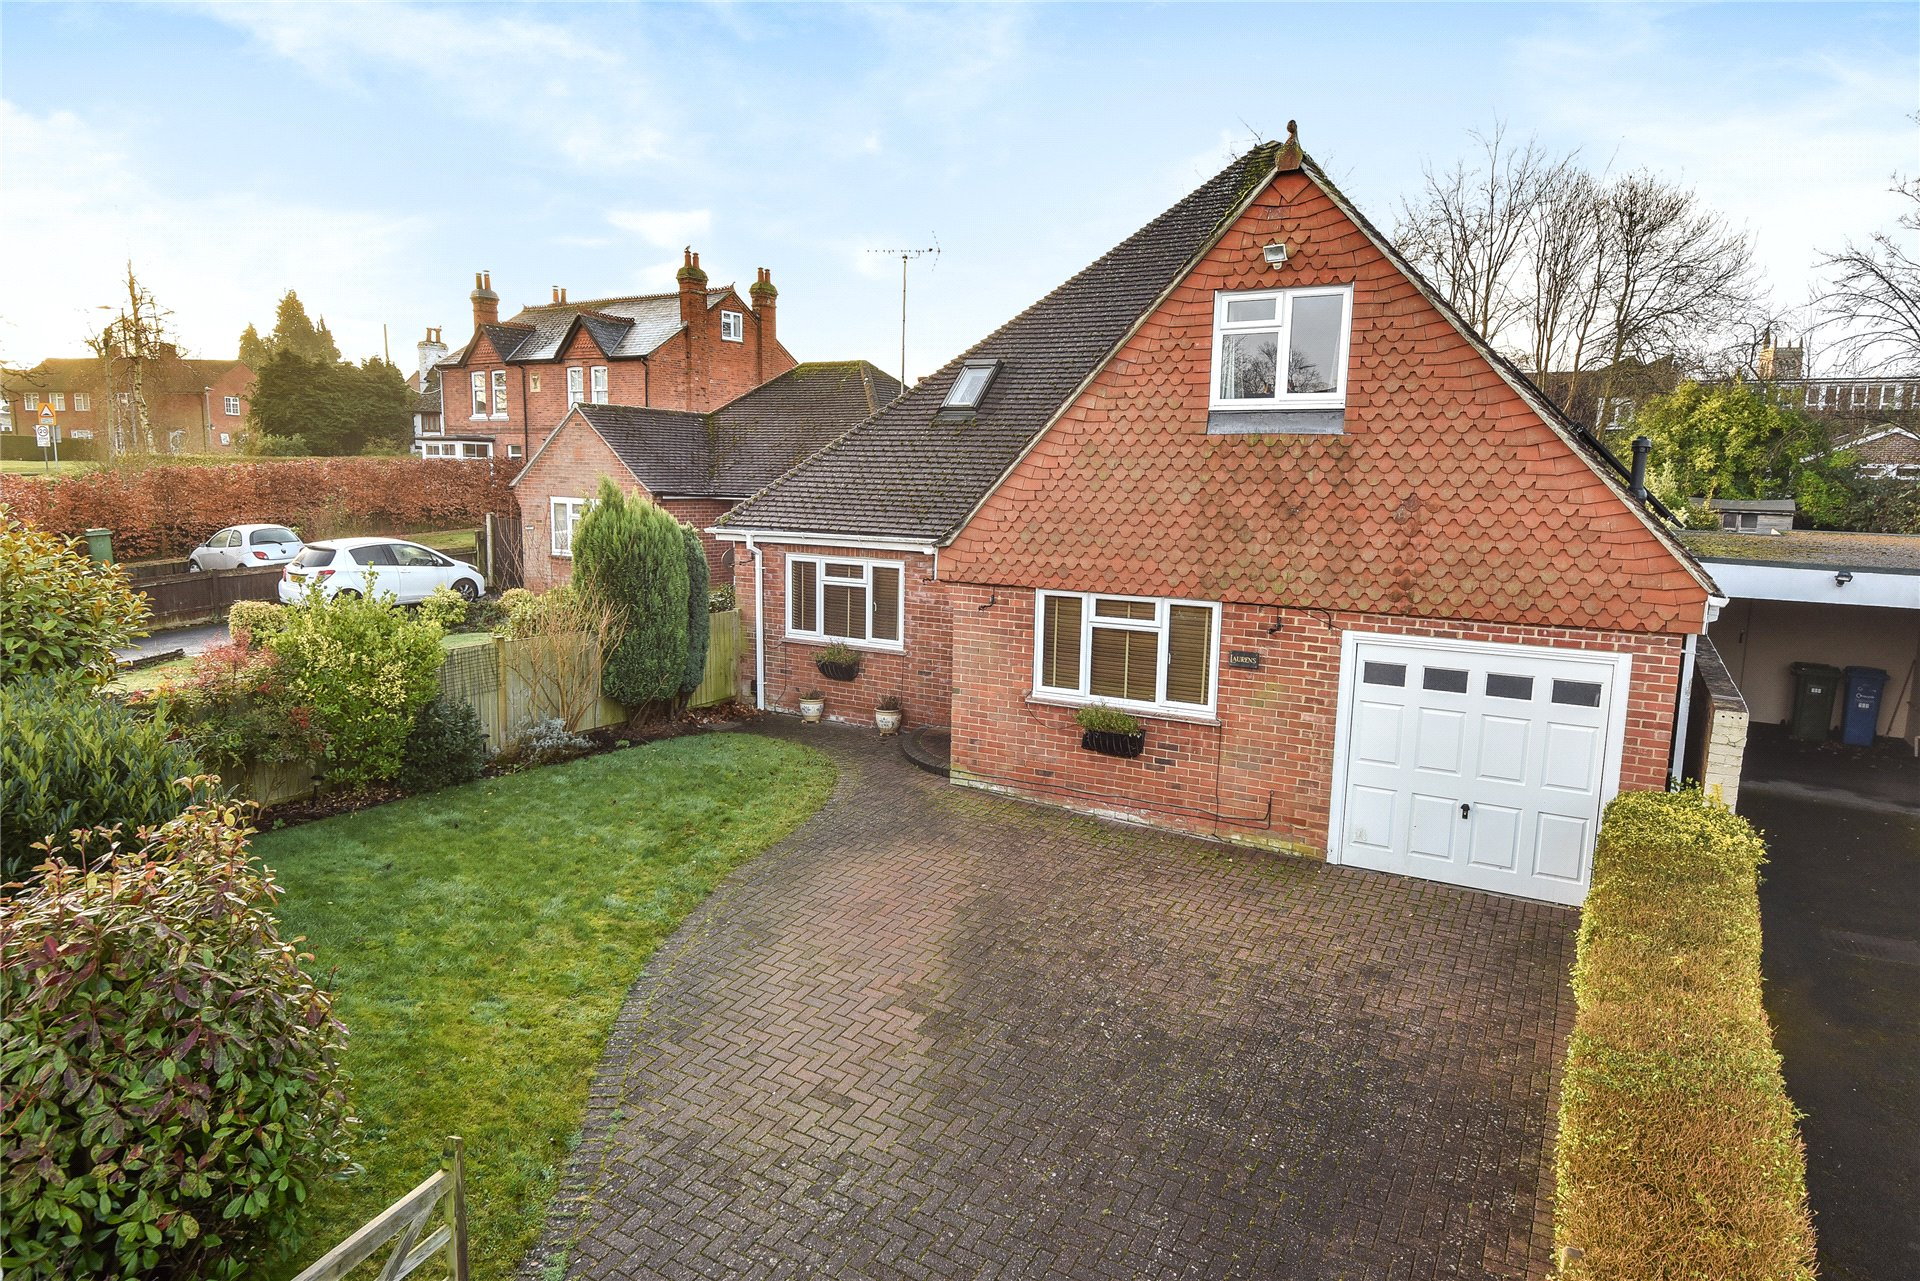 4 Bedrooms Detached House for sale in Crowthorne Road, Bracknell, Berkshire, RG12